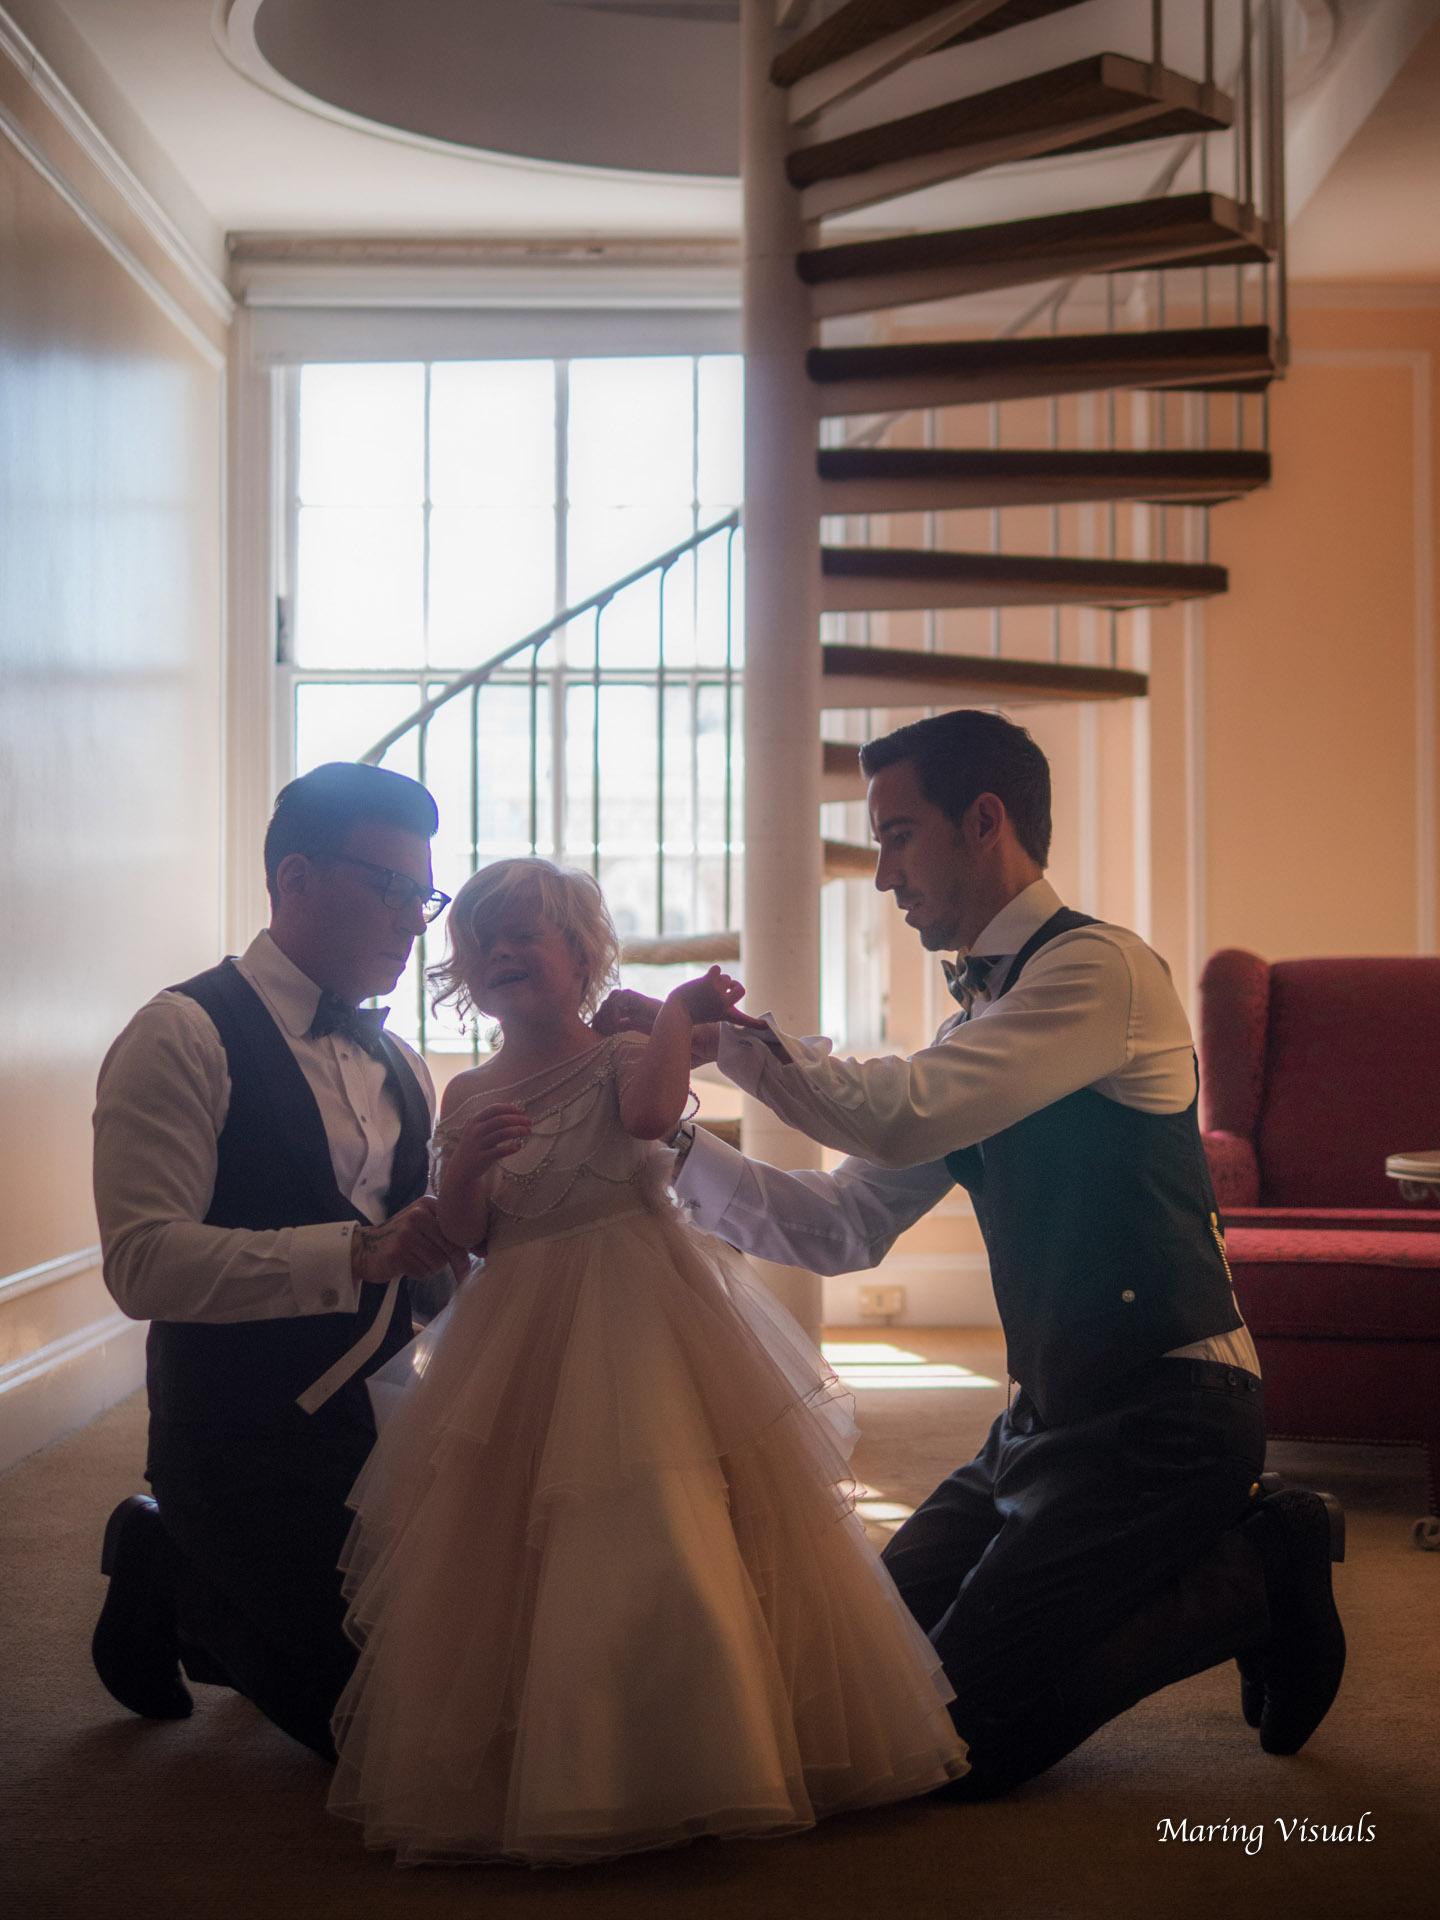 David Tutera Weddings by Maring Visuals 00492.jpg